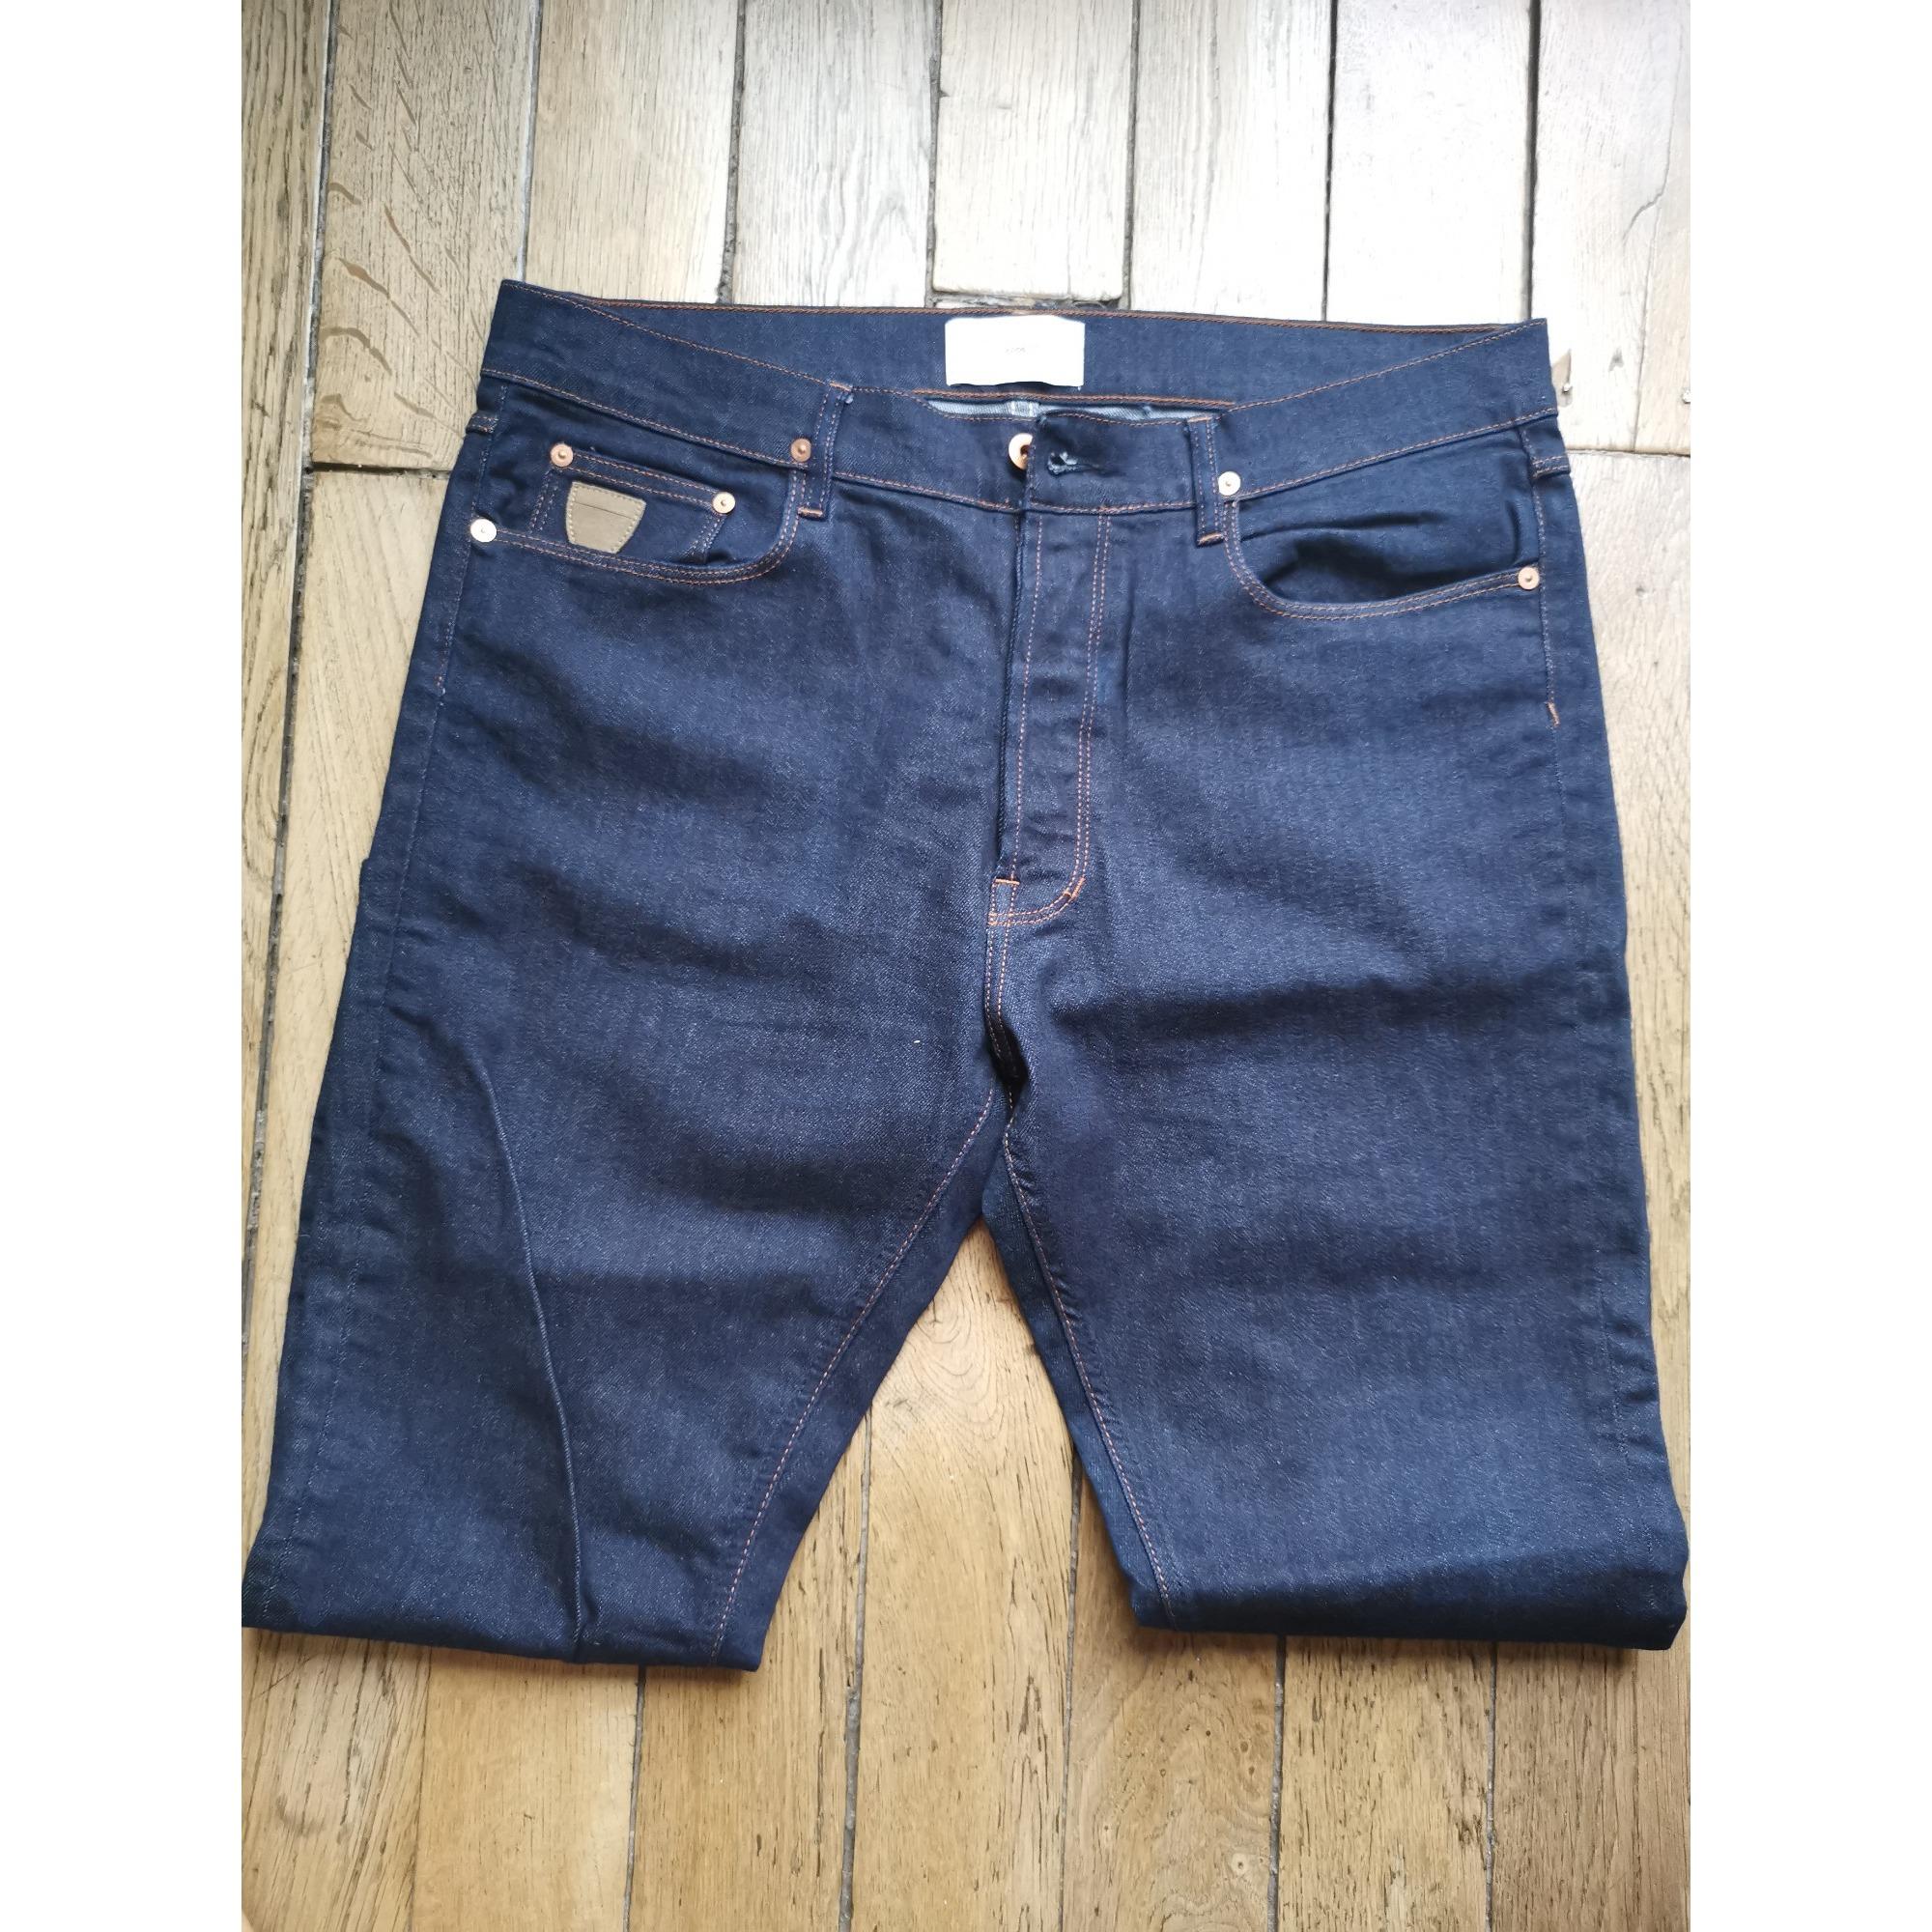 Jeans droit APRIL 77 Bleu, bleu marine, bleu turquoise